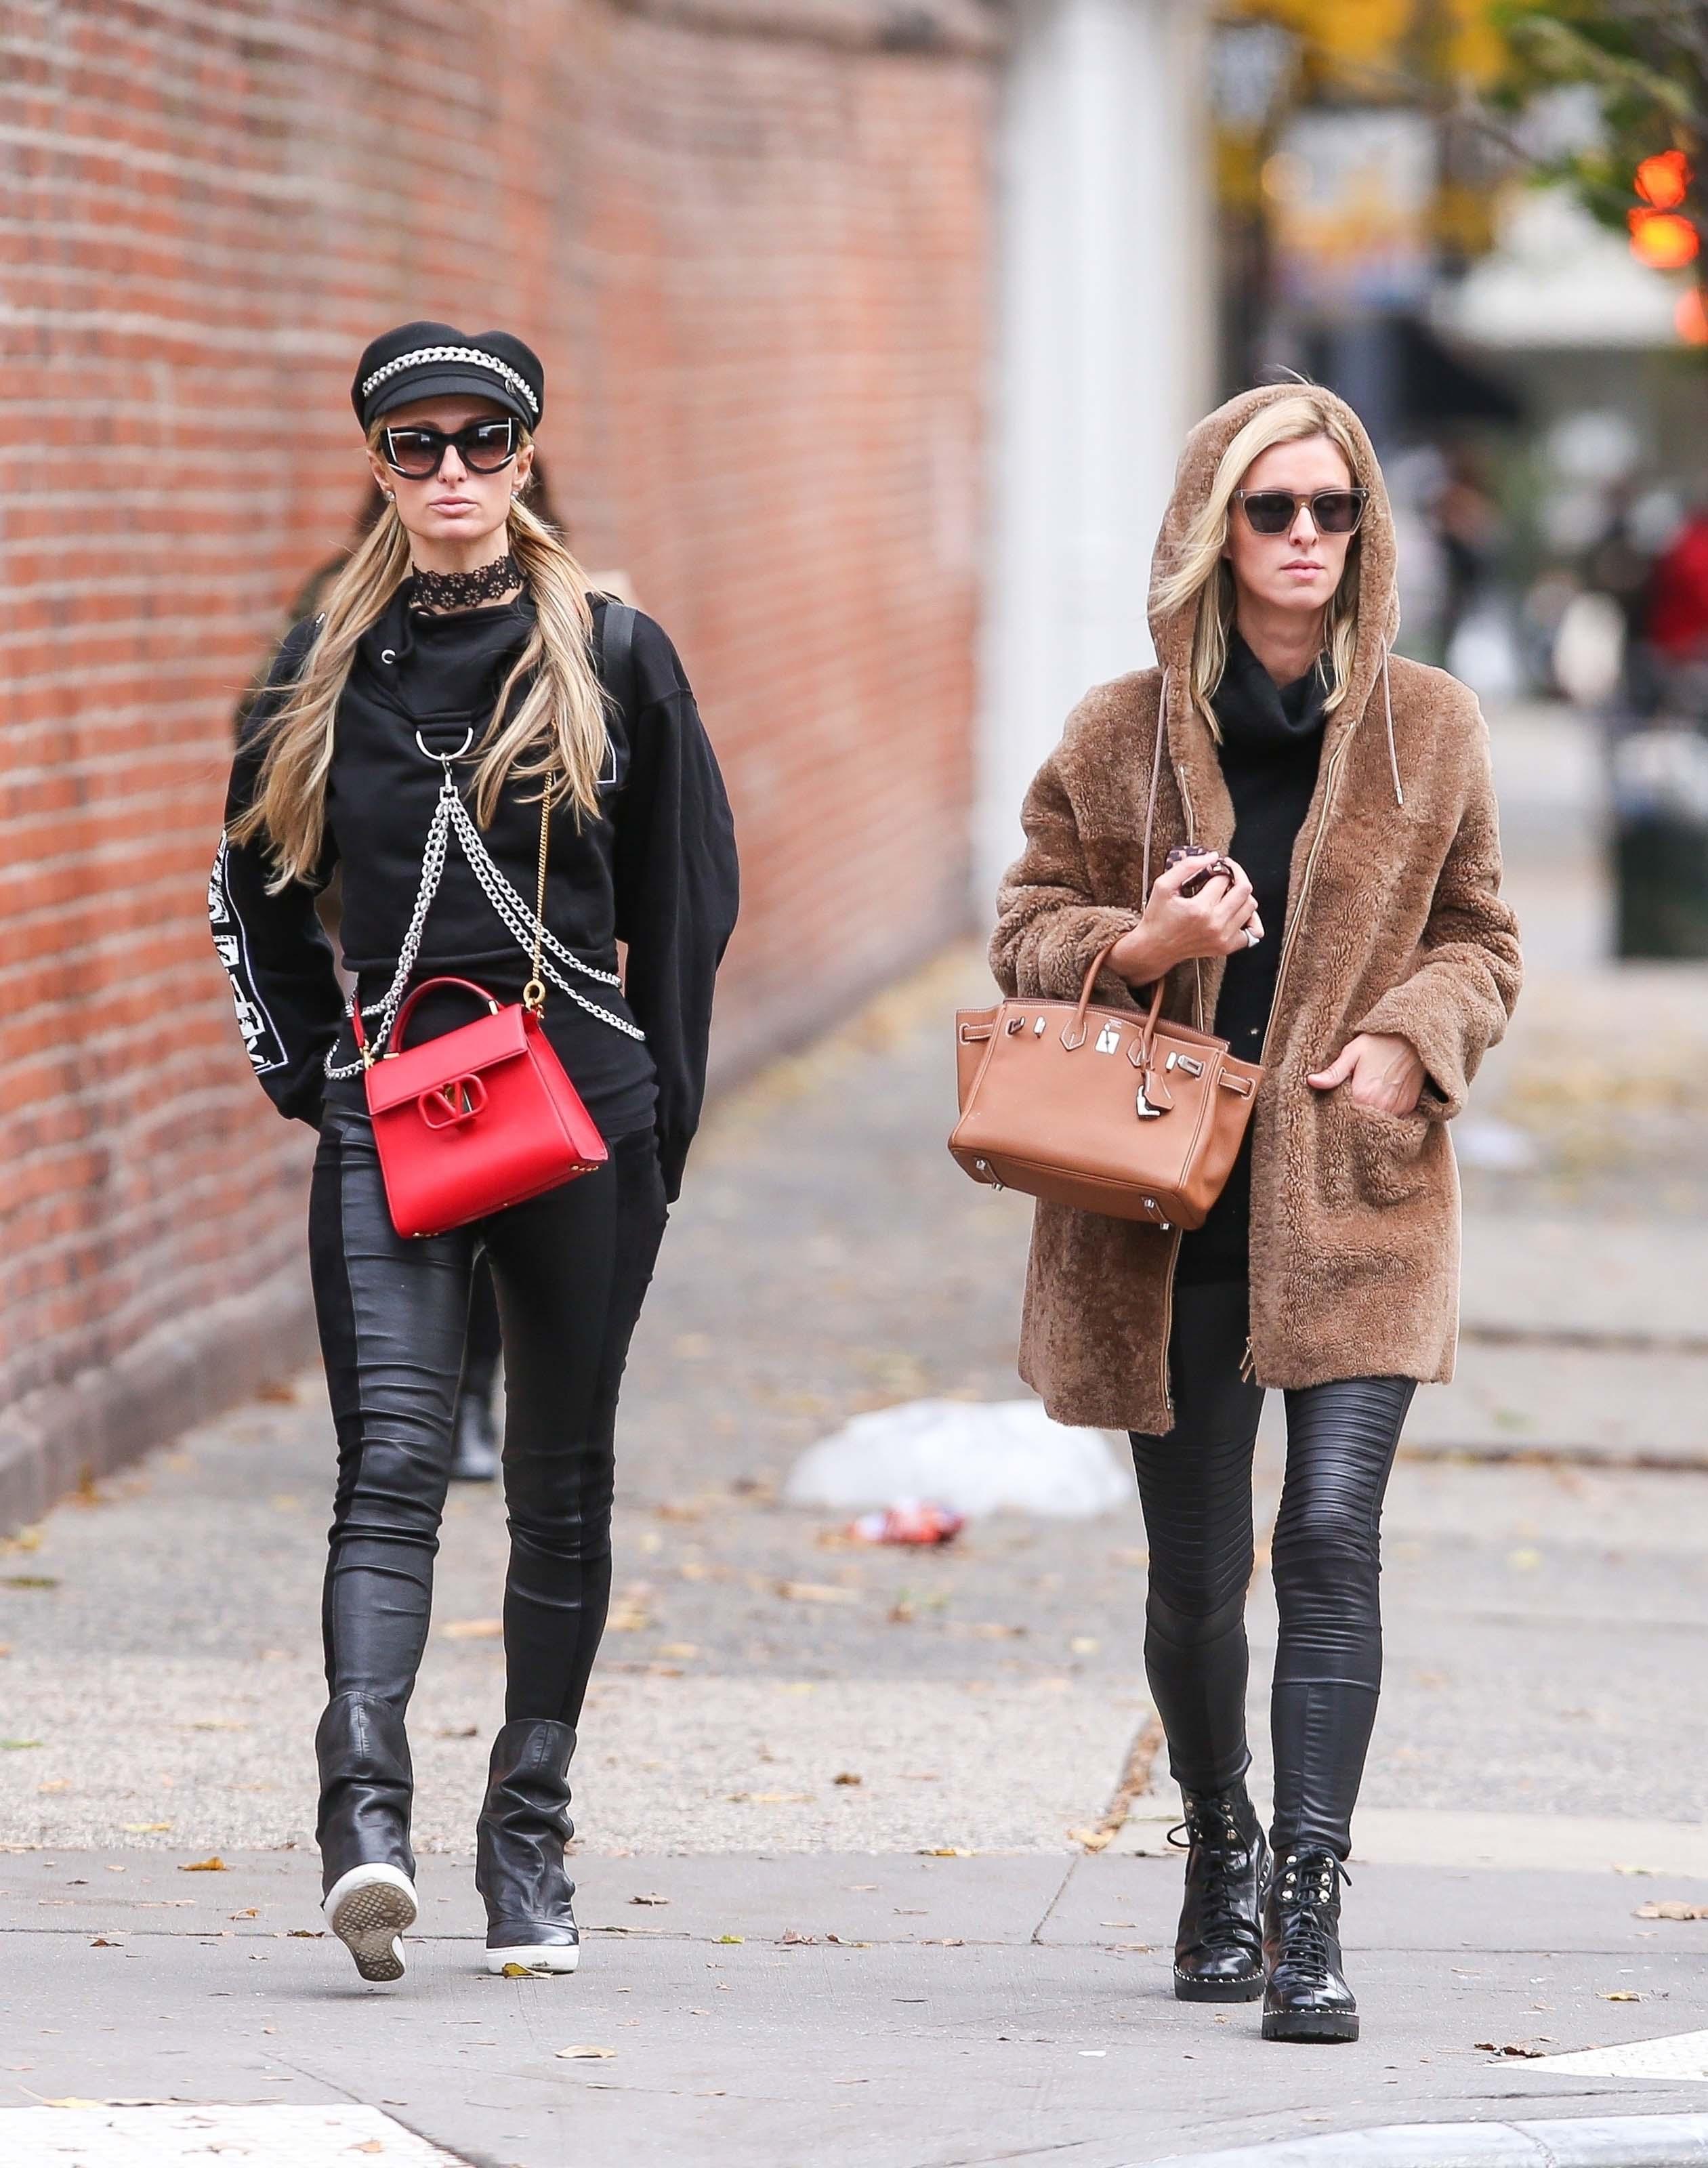 Paris Hilton & Nicky Hilton out shopping in Manhattan's Soho area